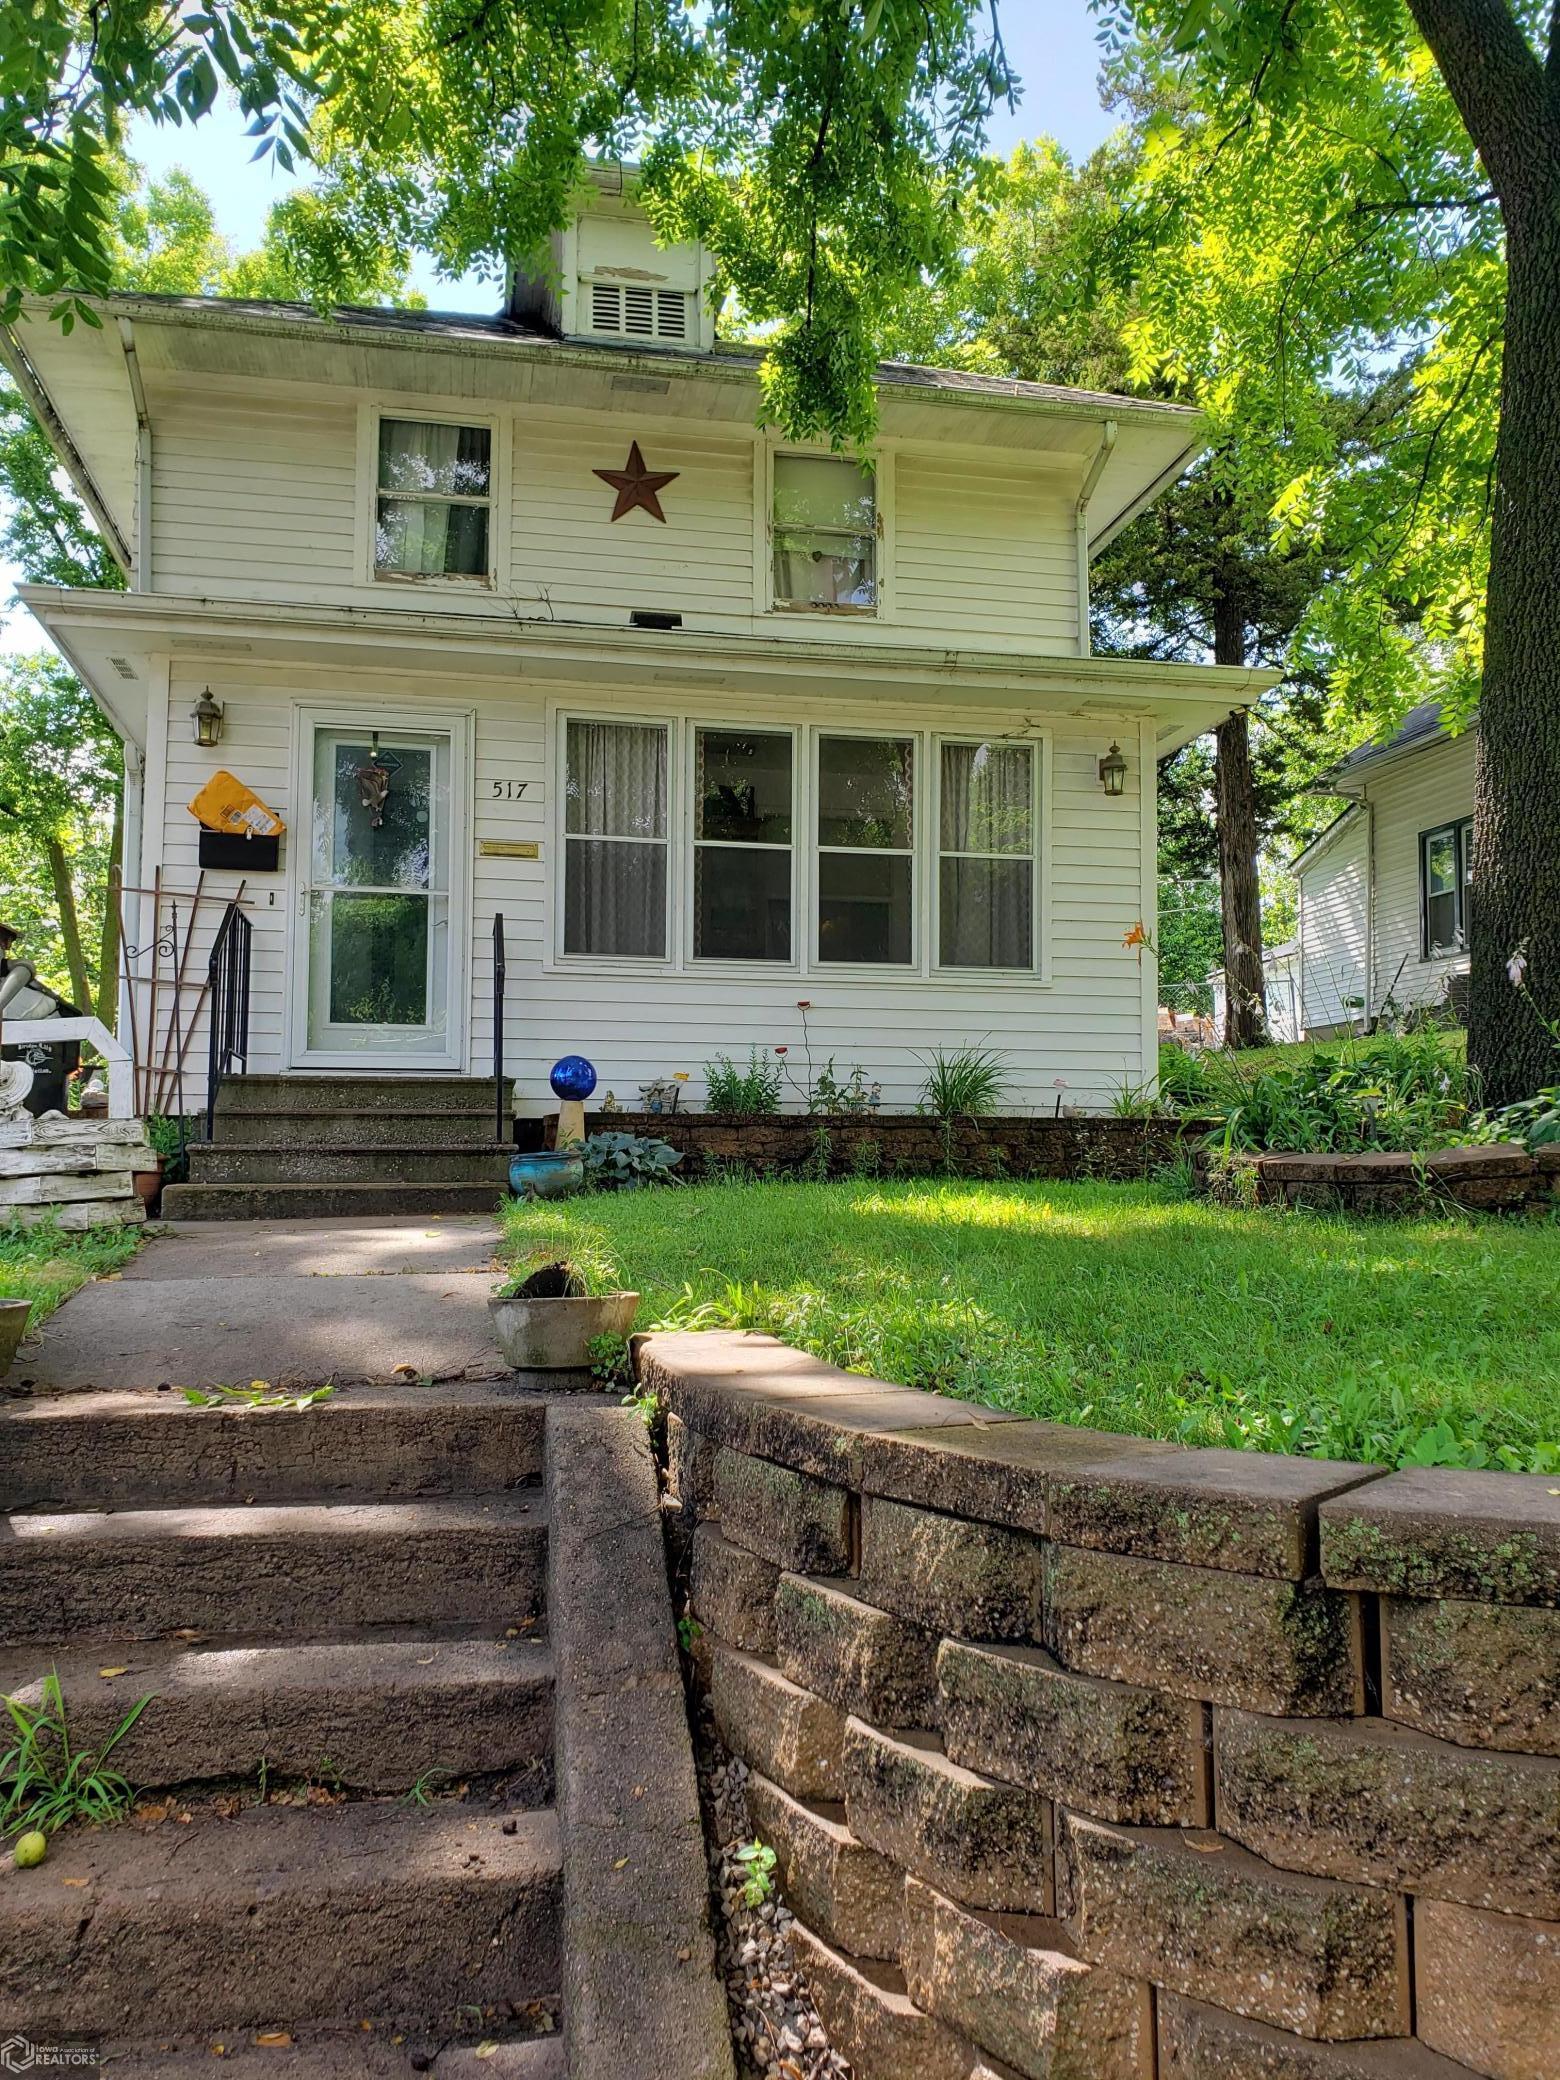 517 Frank Property Photo - Ottumwa, IA real estate listing